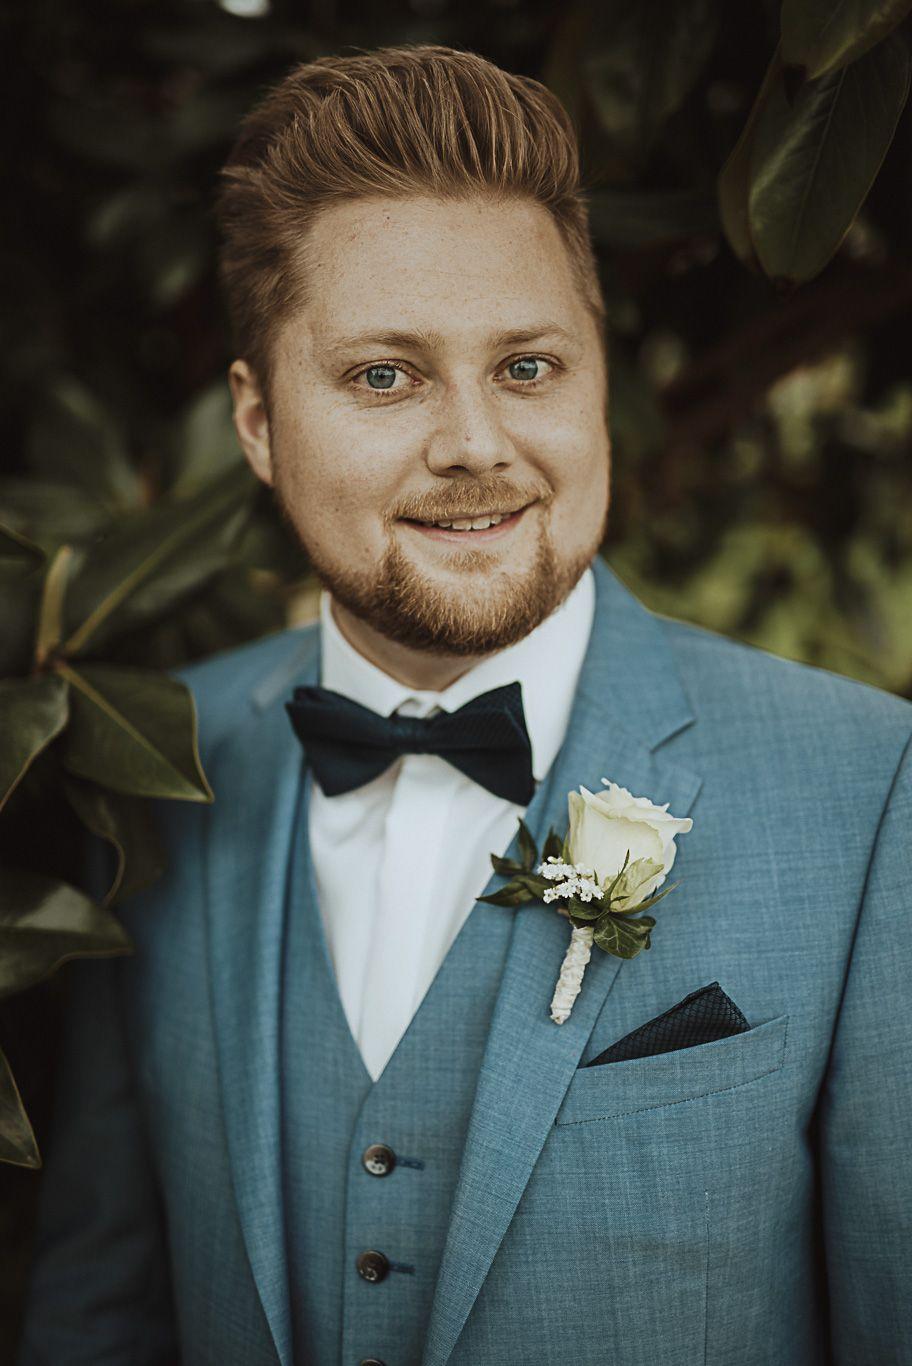 Hochzeitsfotograf Fitz Ritter Bad Dürkheim